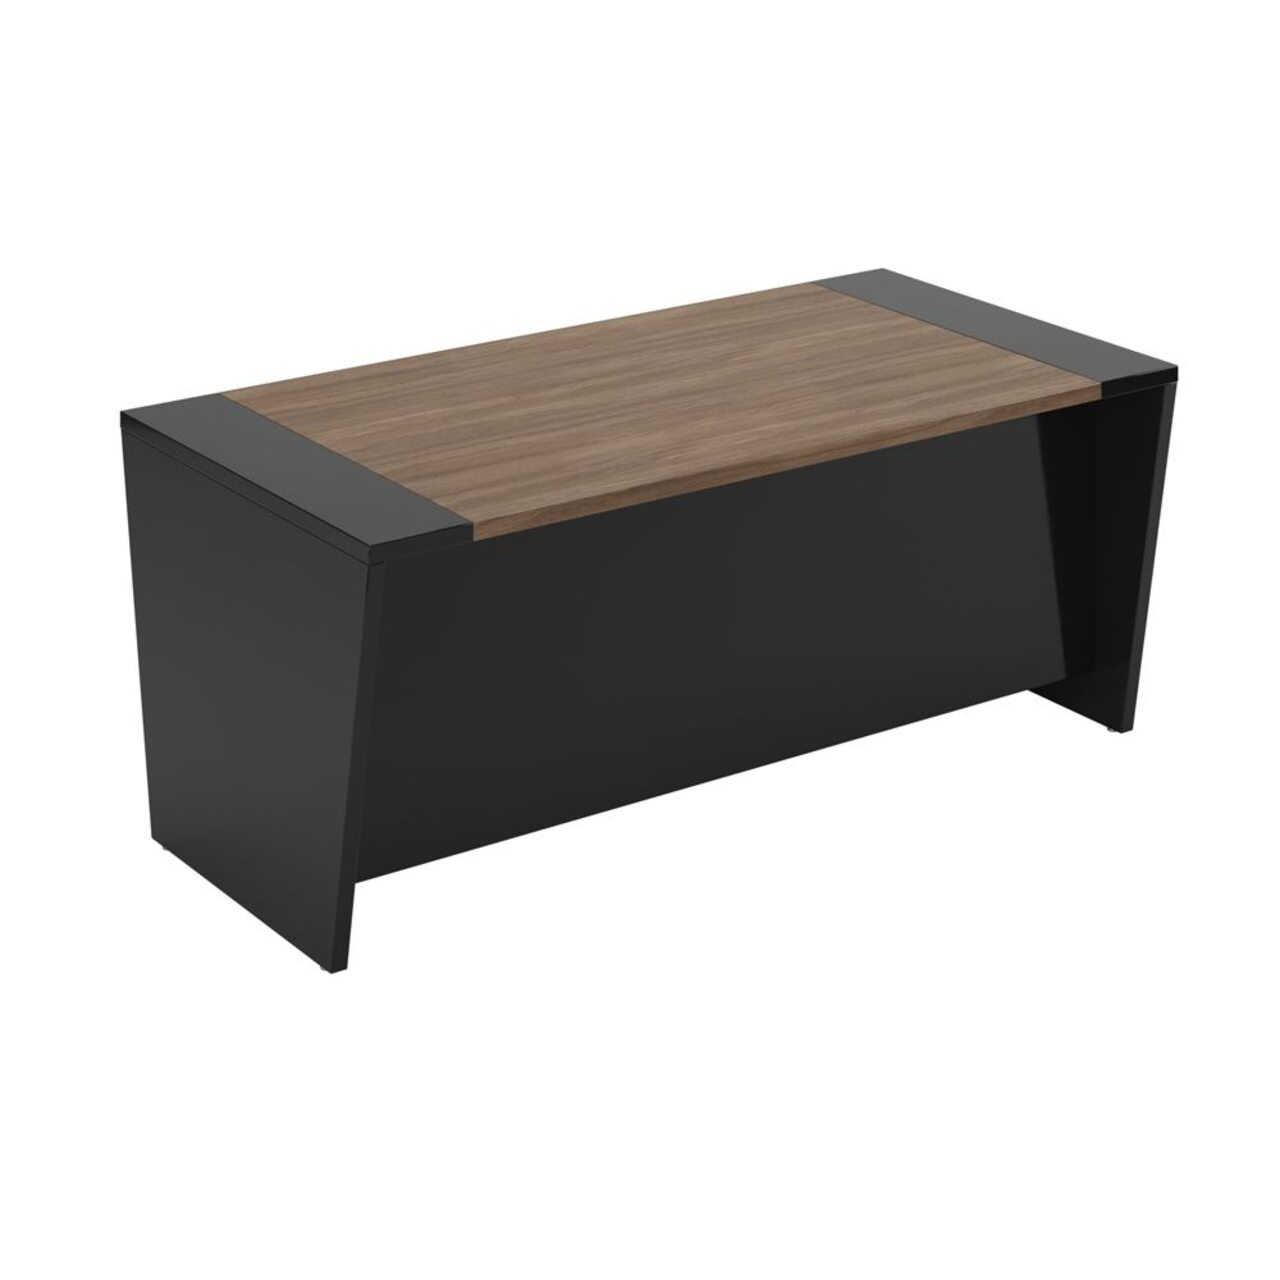 Стол письменный 180 (панель глянец)  ASTI 180x90x75 - фото 3